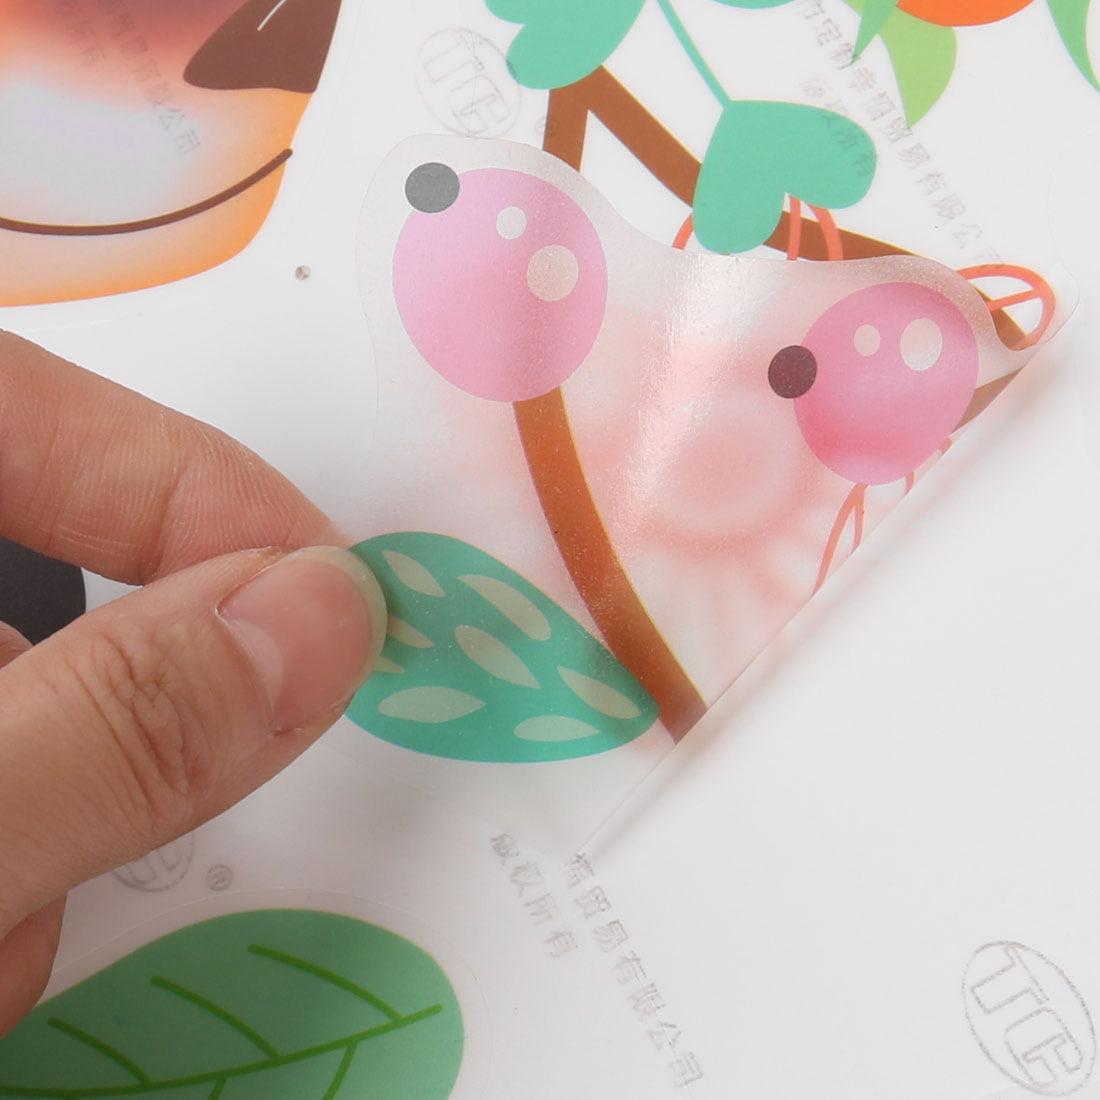 Room PVC Deer Pattern Self-adhesive Window Film Wall Sticker Decal Multicolor - image 2 of 3